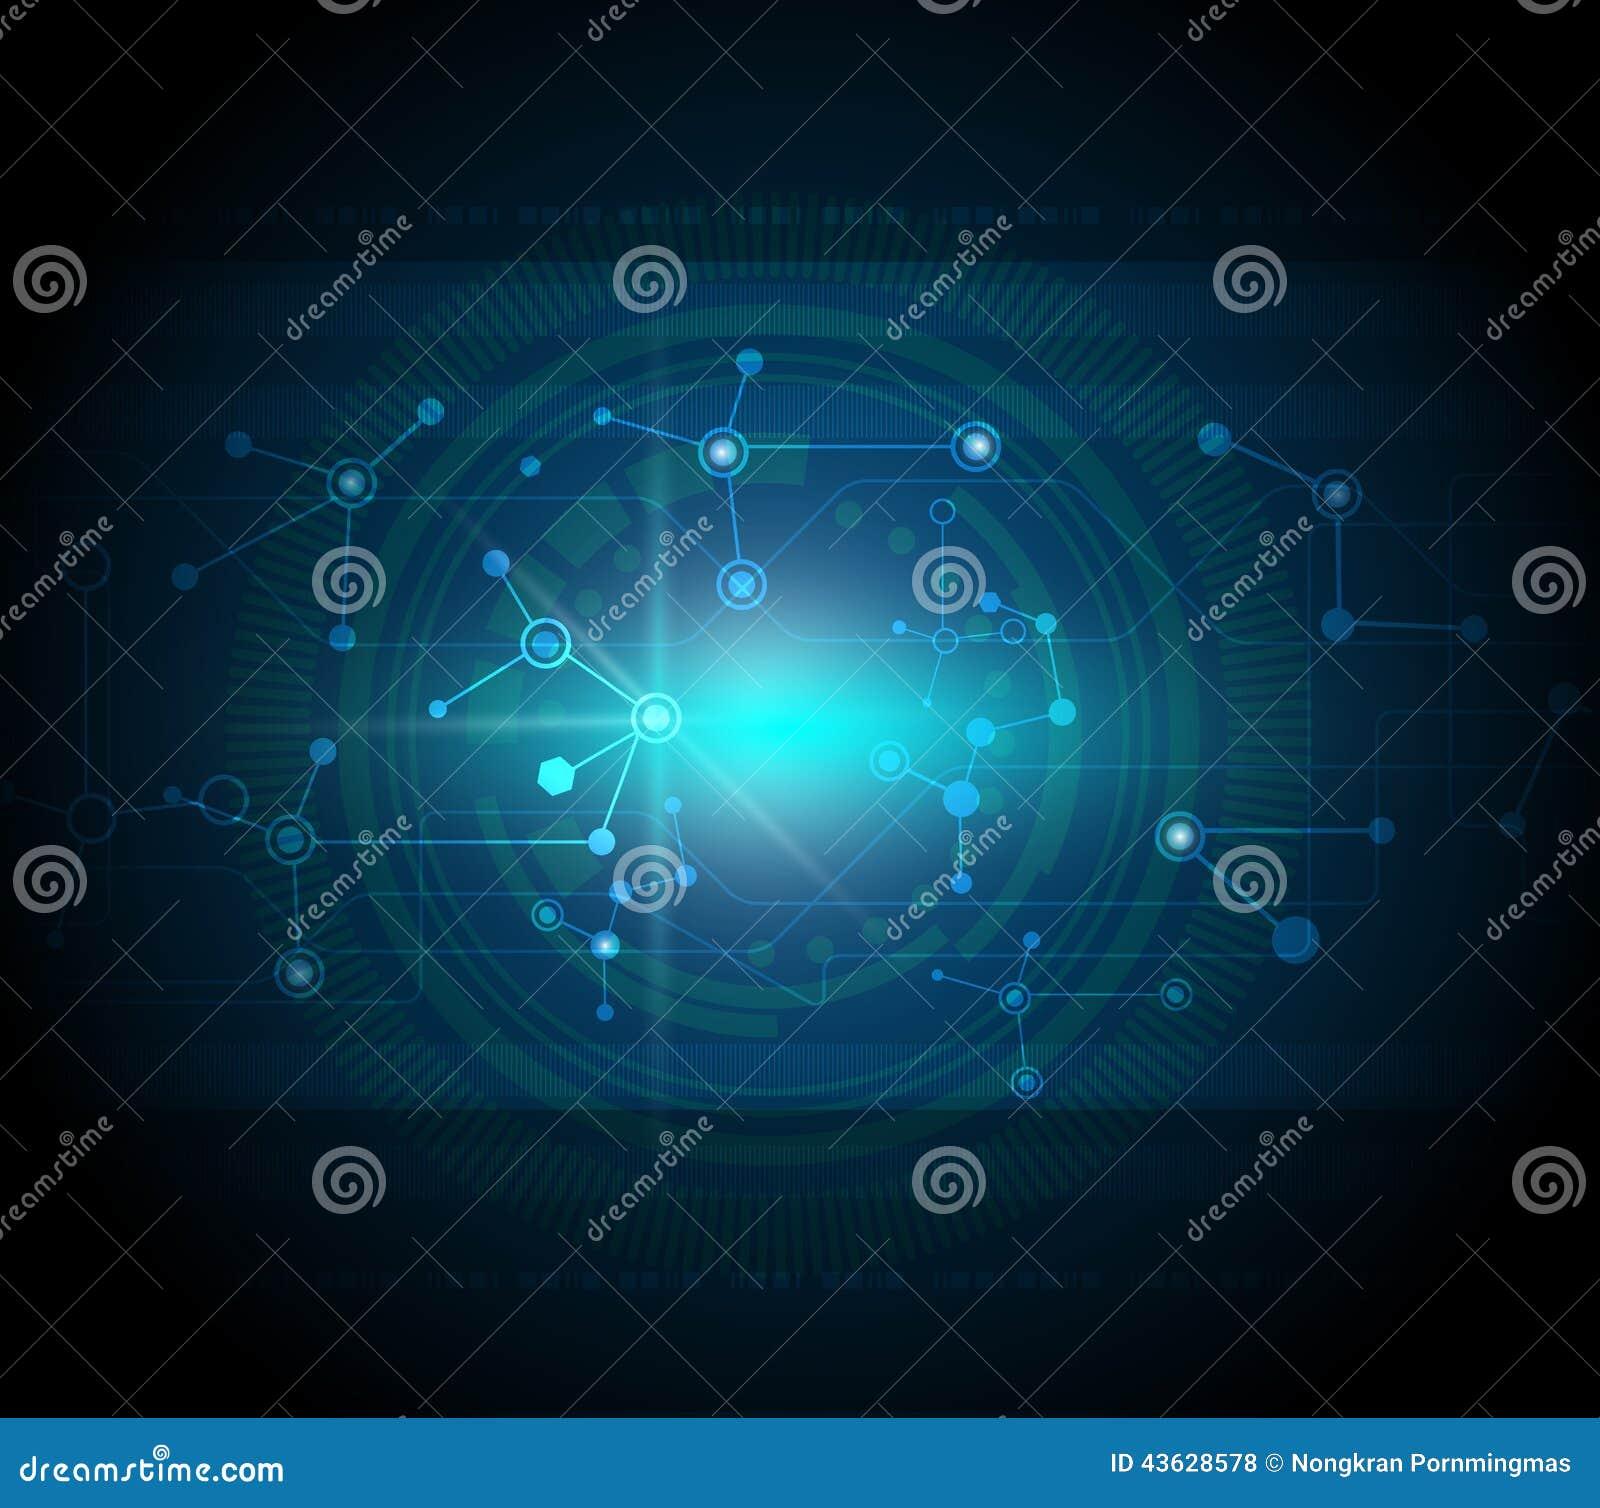 Blue Technology: Blue Abstract Technology Hi-tech Background Stock Vector